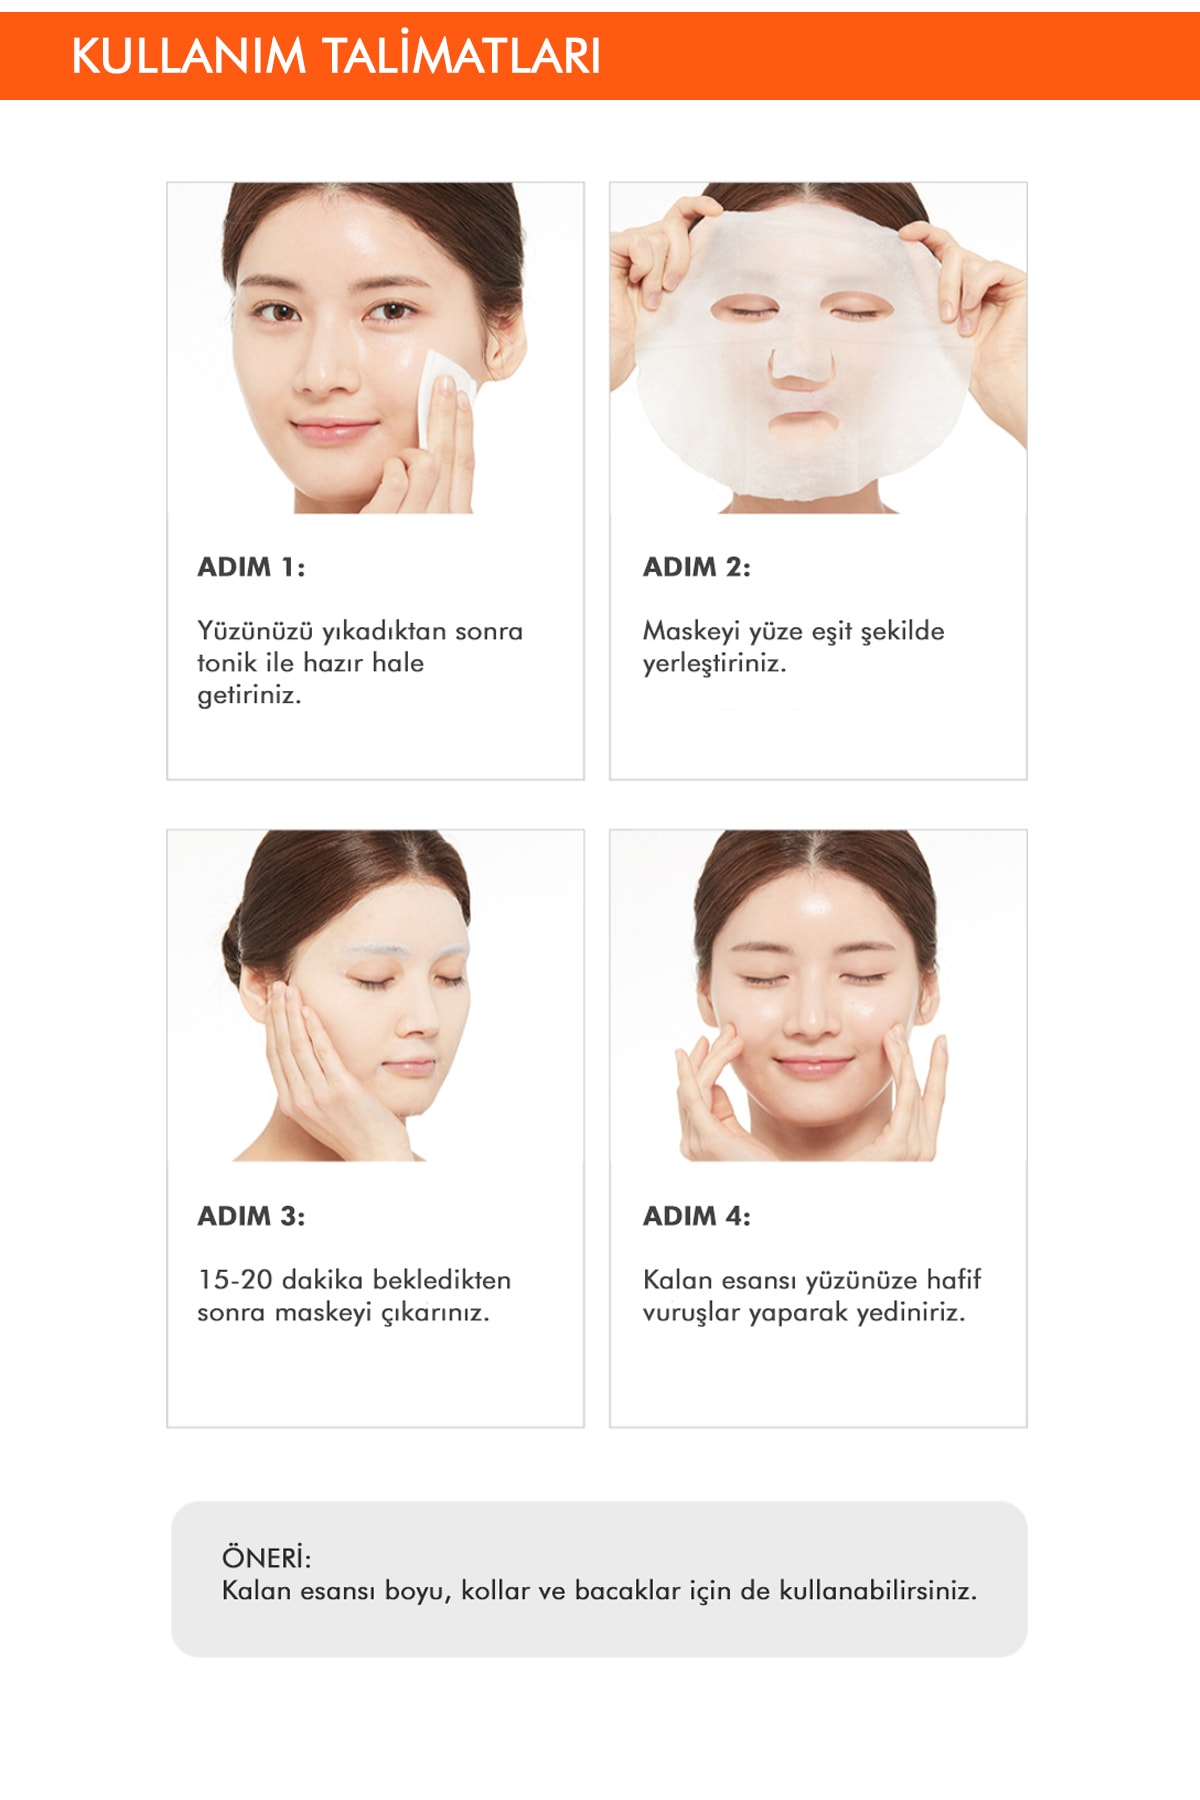 Missha Yaşlanma Karşıtı Nar Özlü Sıkılaştırıcı Yaprak Maske (1ad) Airy Fit Sheet Mask Pomegranate 4